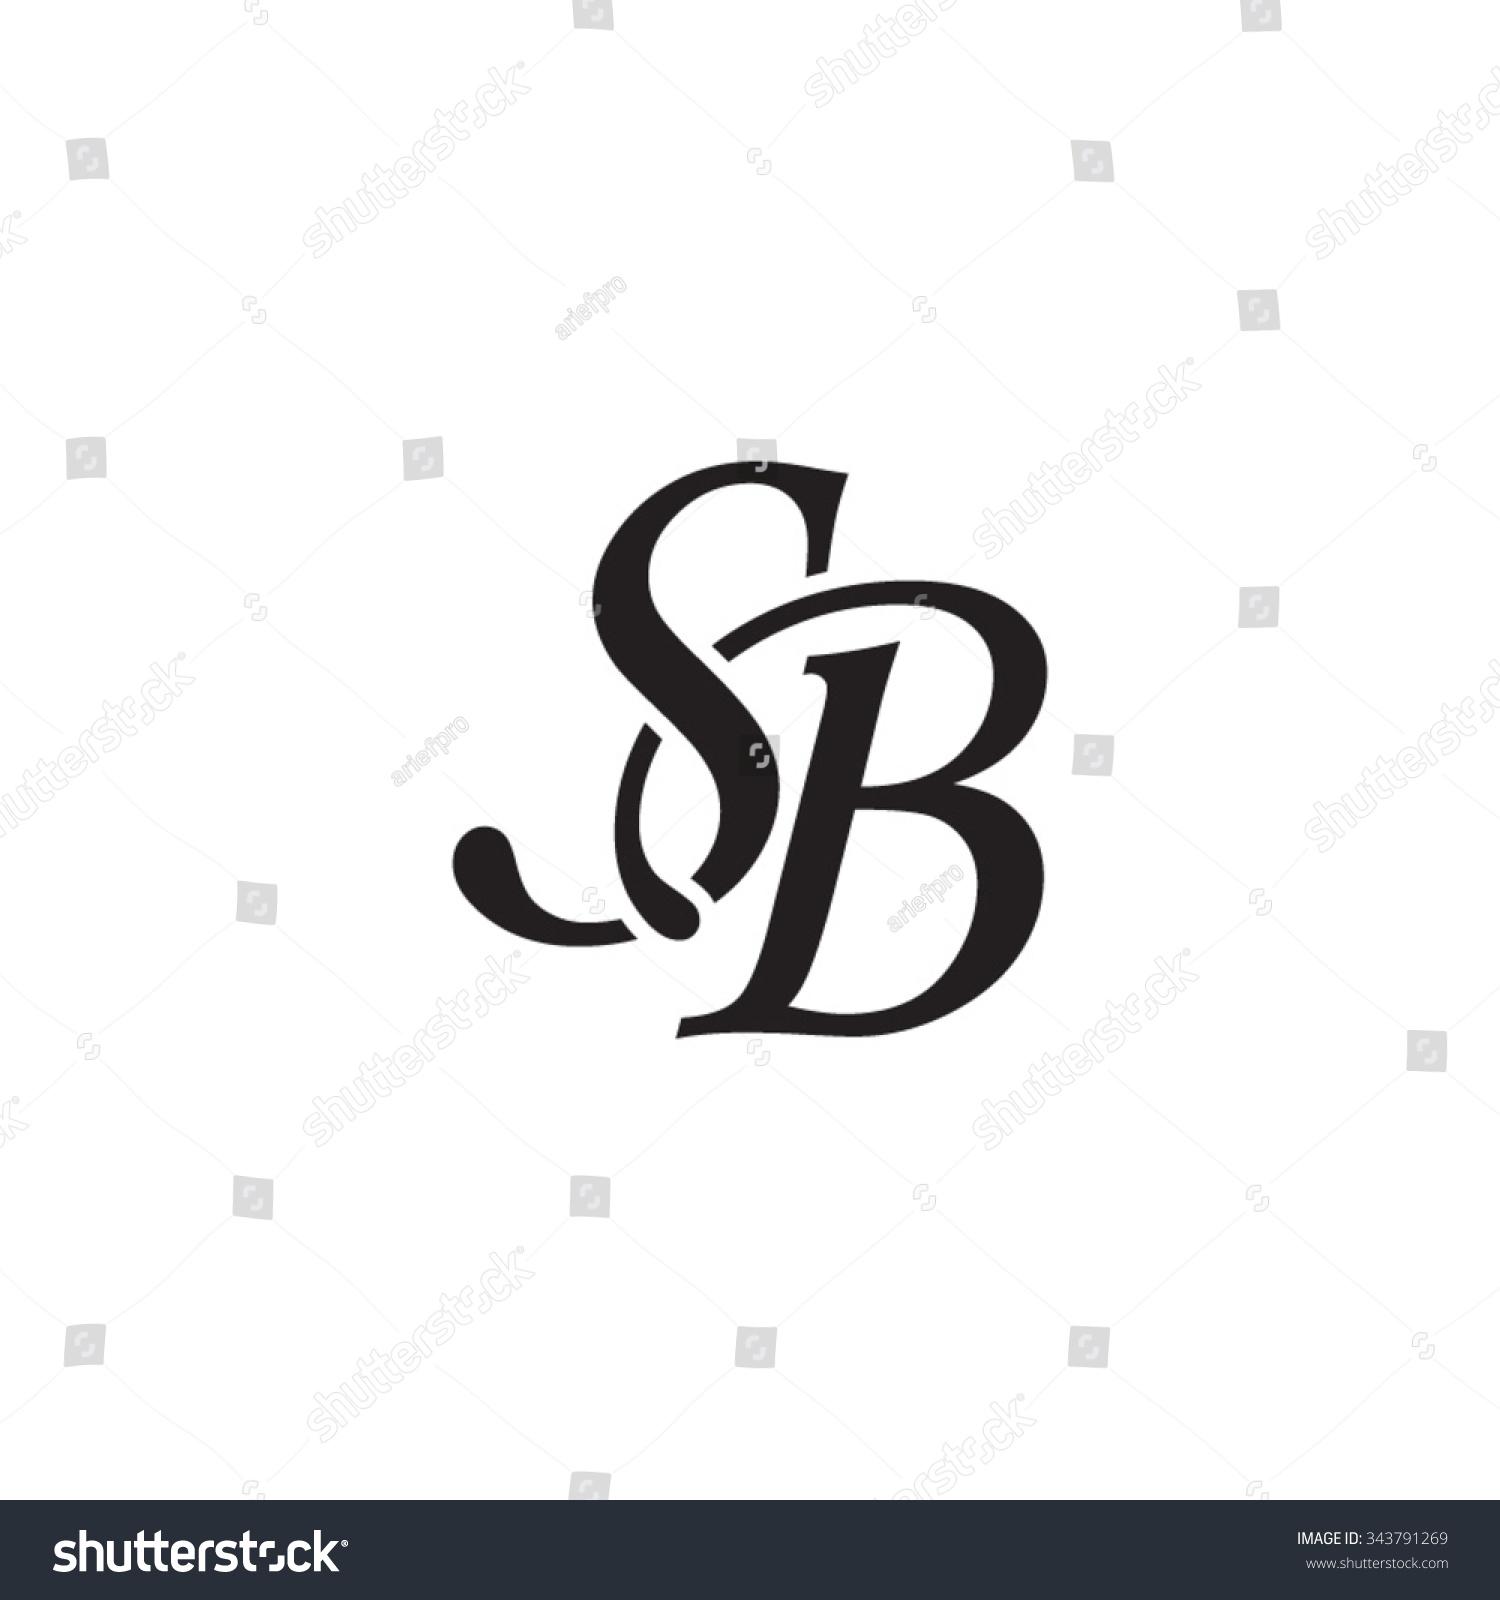 Sb Initial Monogram Logo Stock Vector 343791269 - Shutterstock